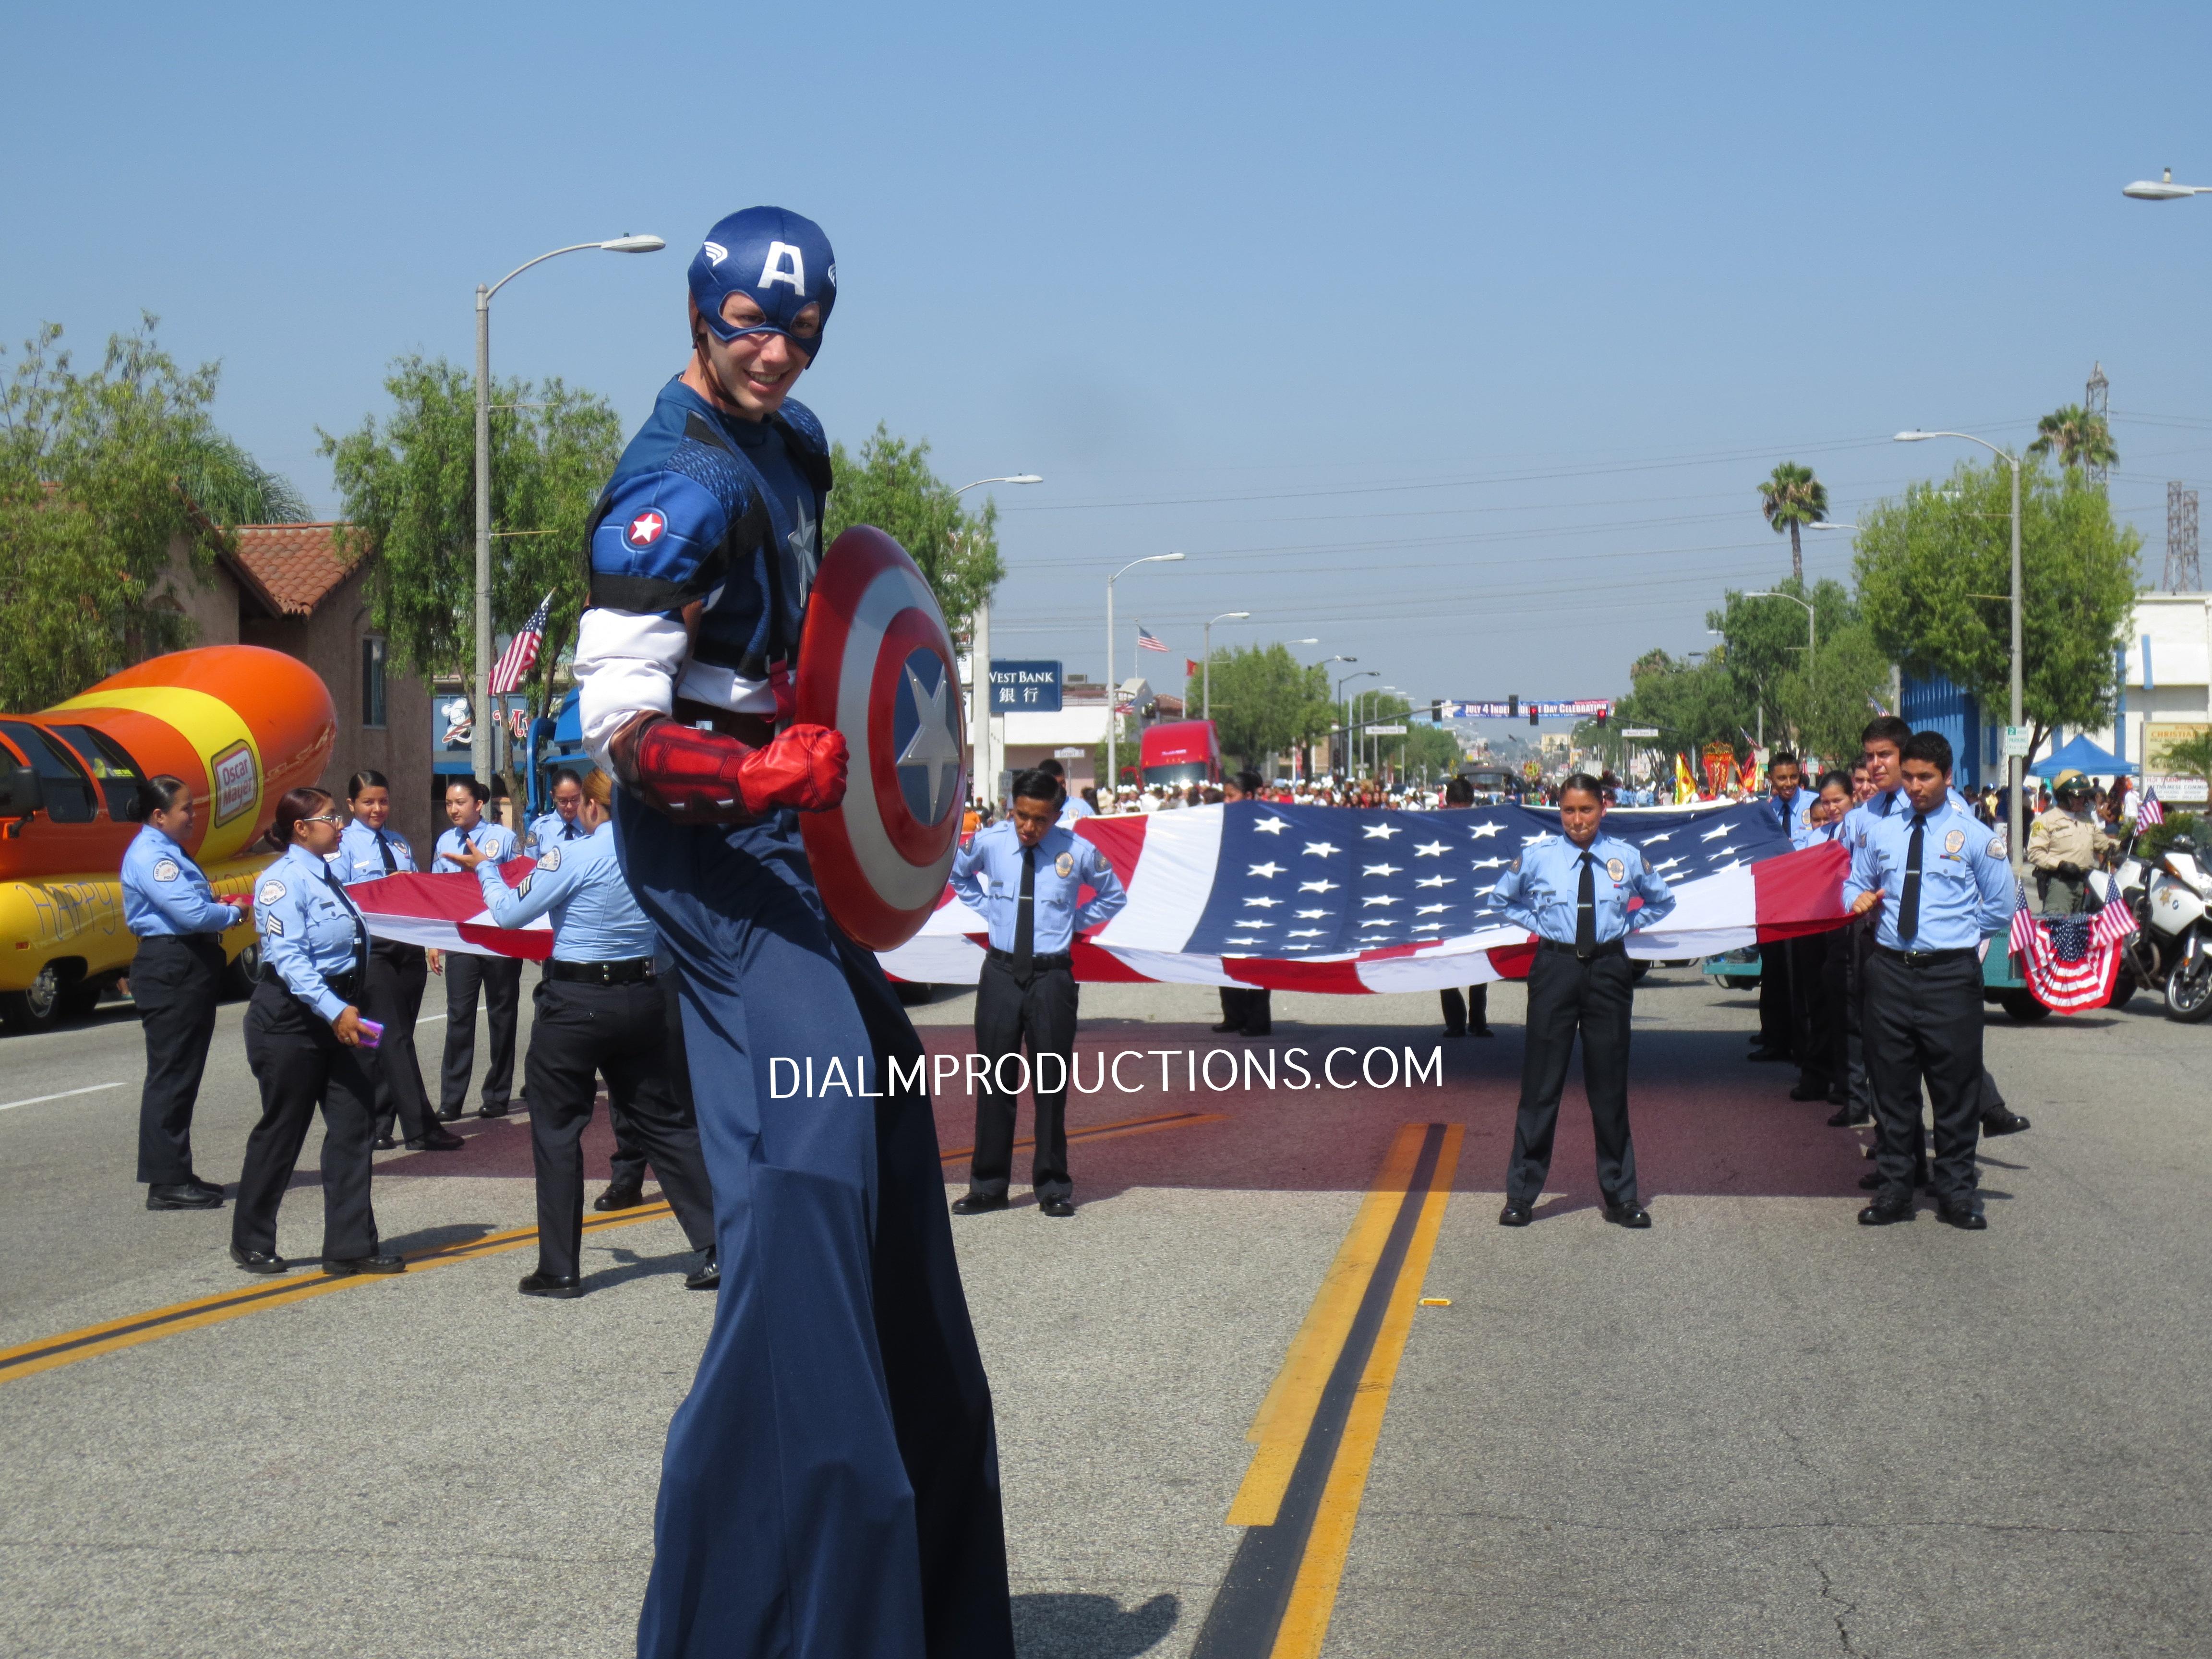 Captain America Stilt Walker Parade #CaptainAmerica #DIALM #StitlWalker #LosAngeles #EventPlanner